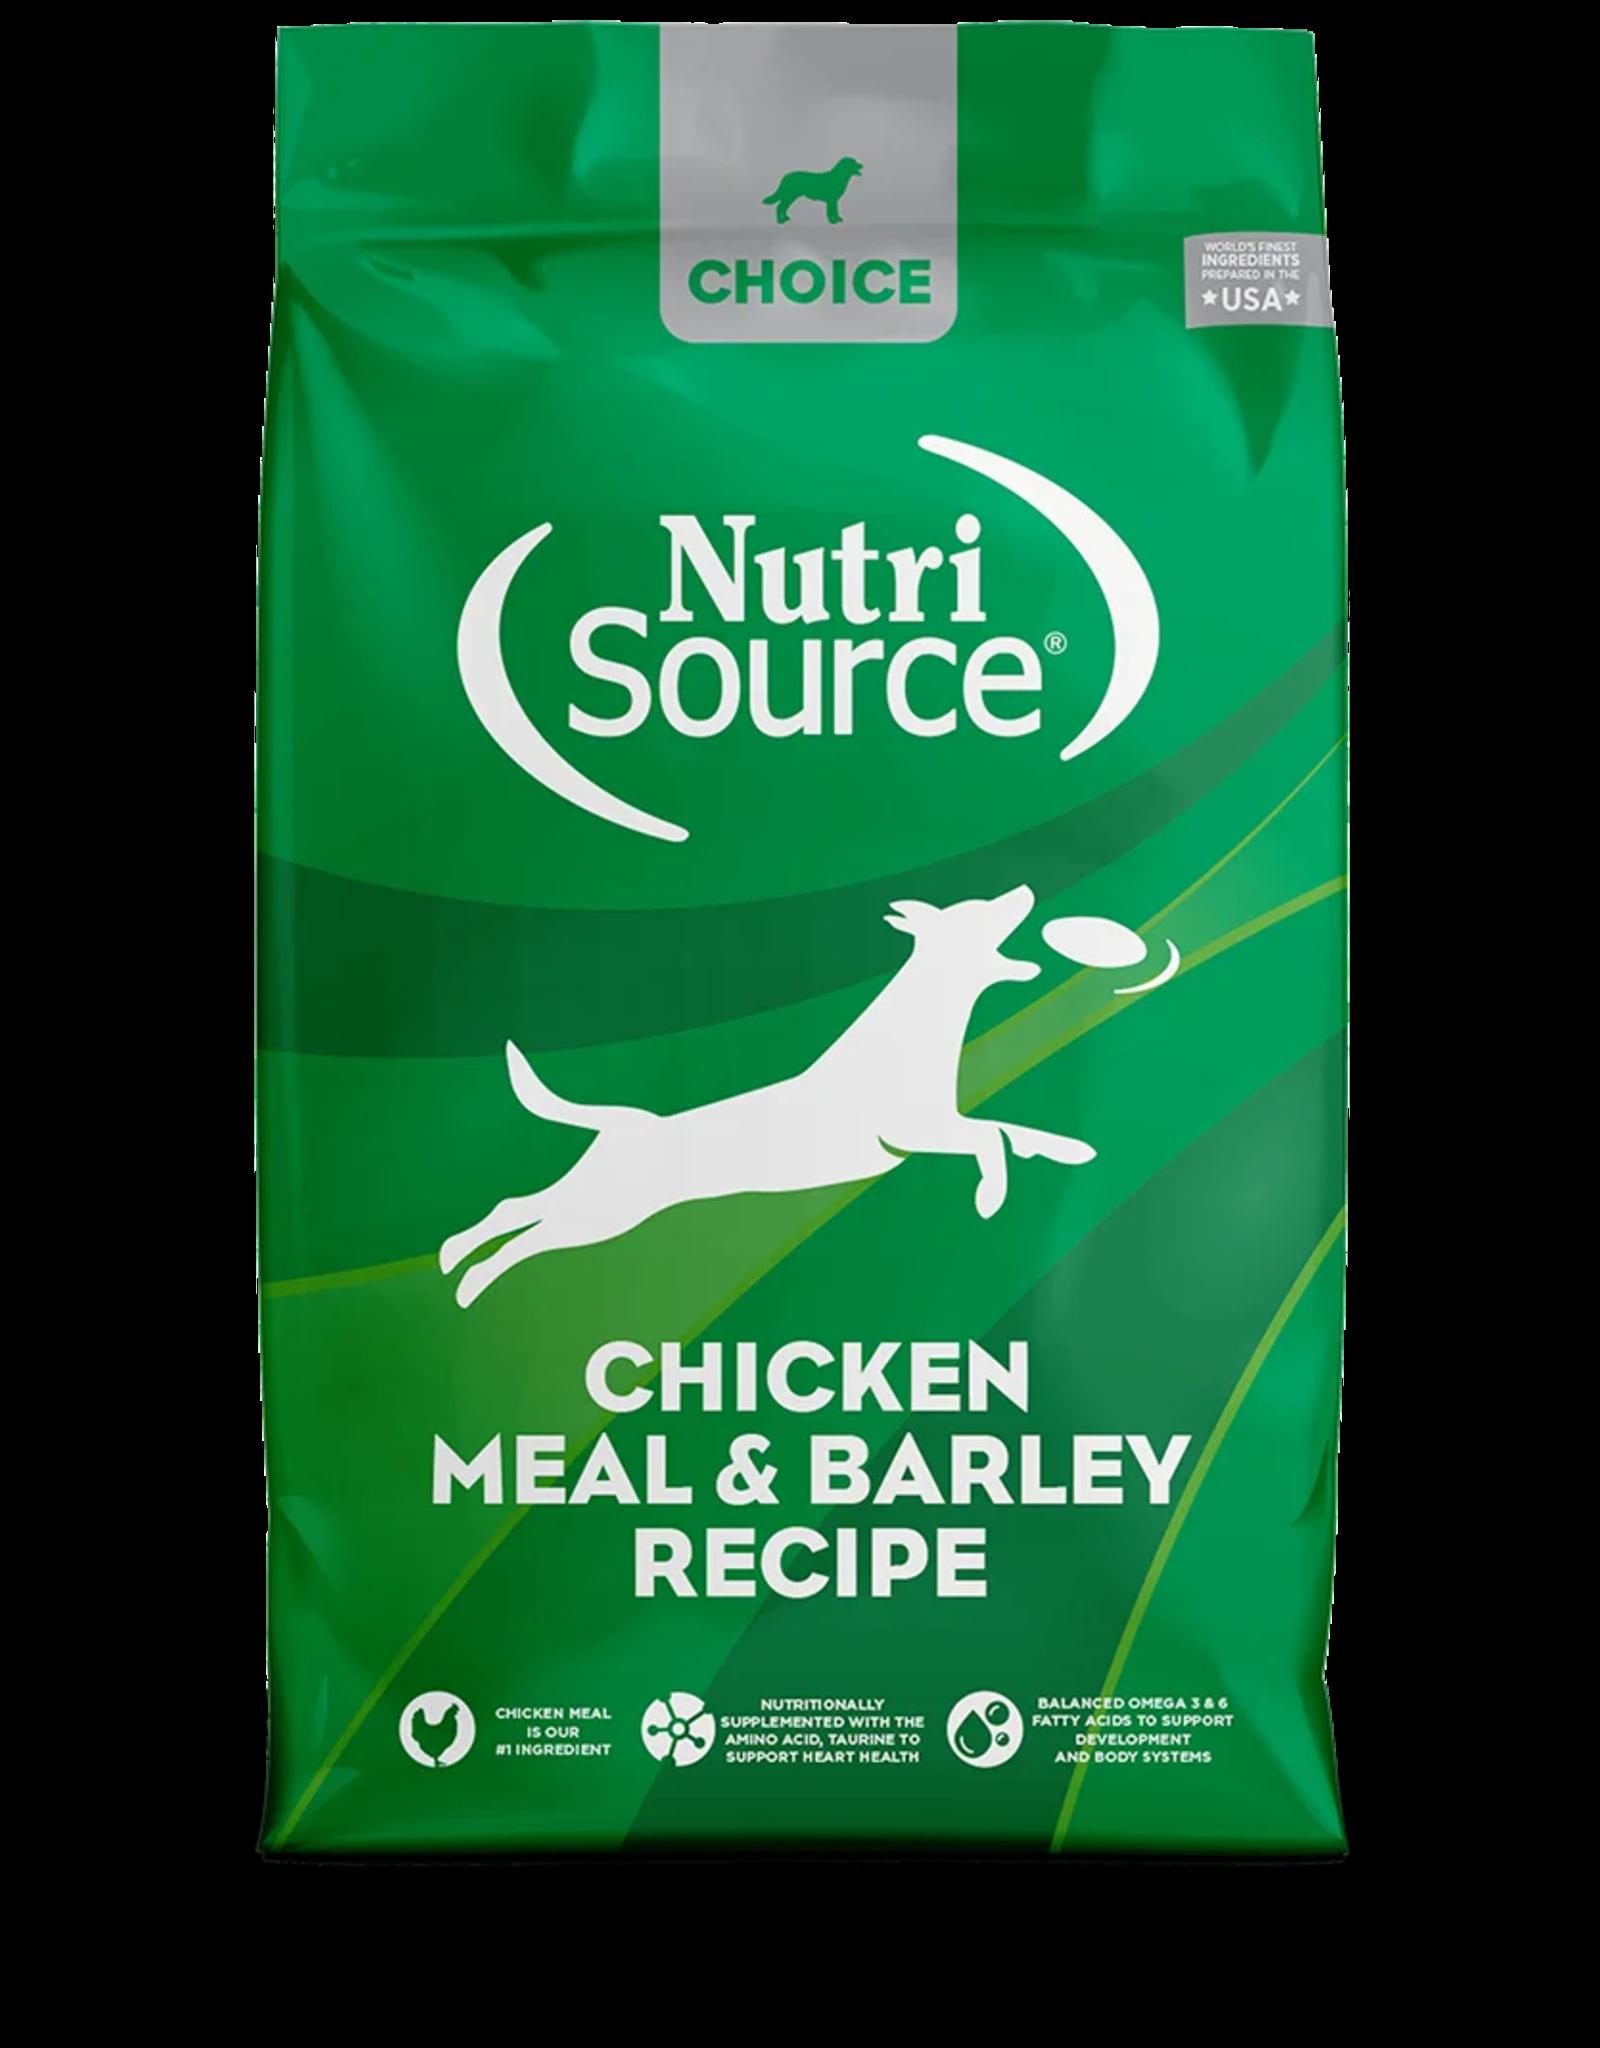 NutriSource Pet Foods NUTRISOURCE DOG CHOICE CHICKEN MEAL & BARLEY RECIPE